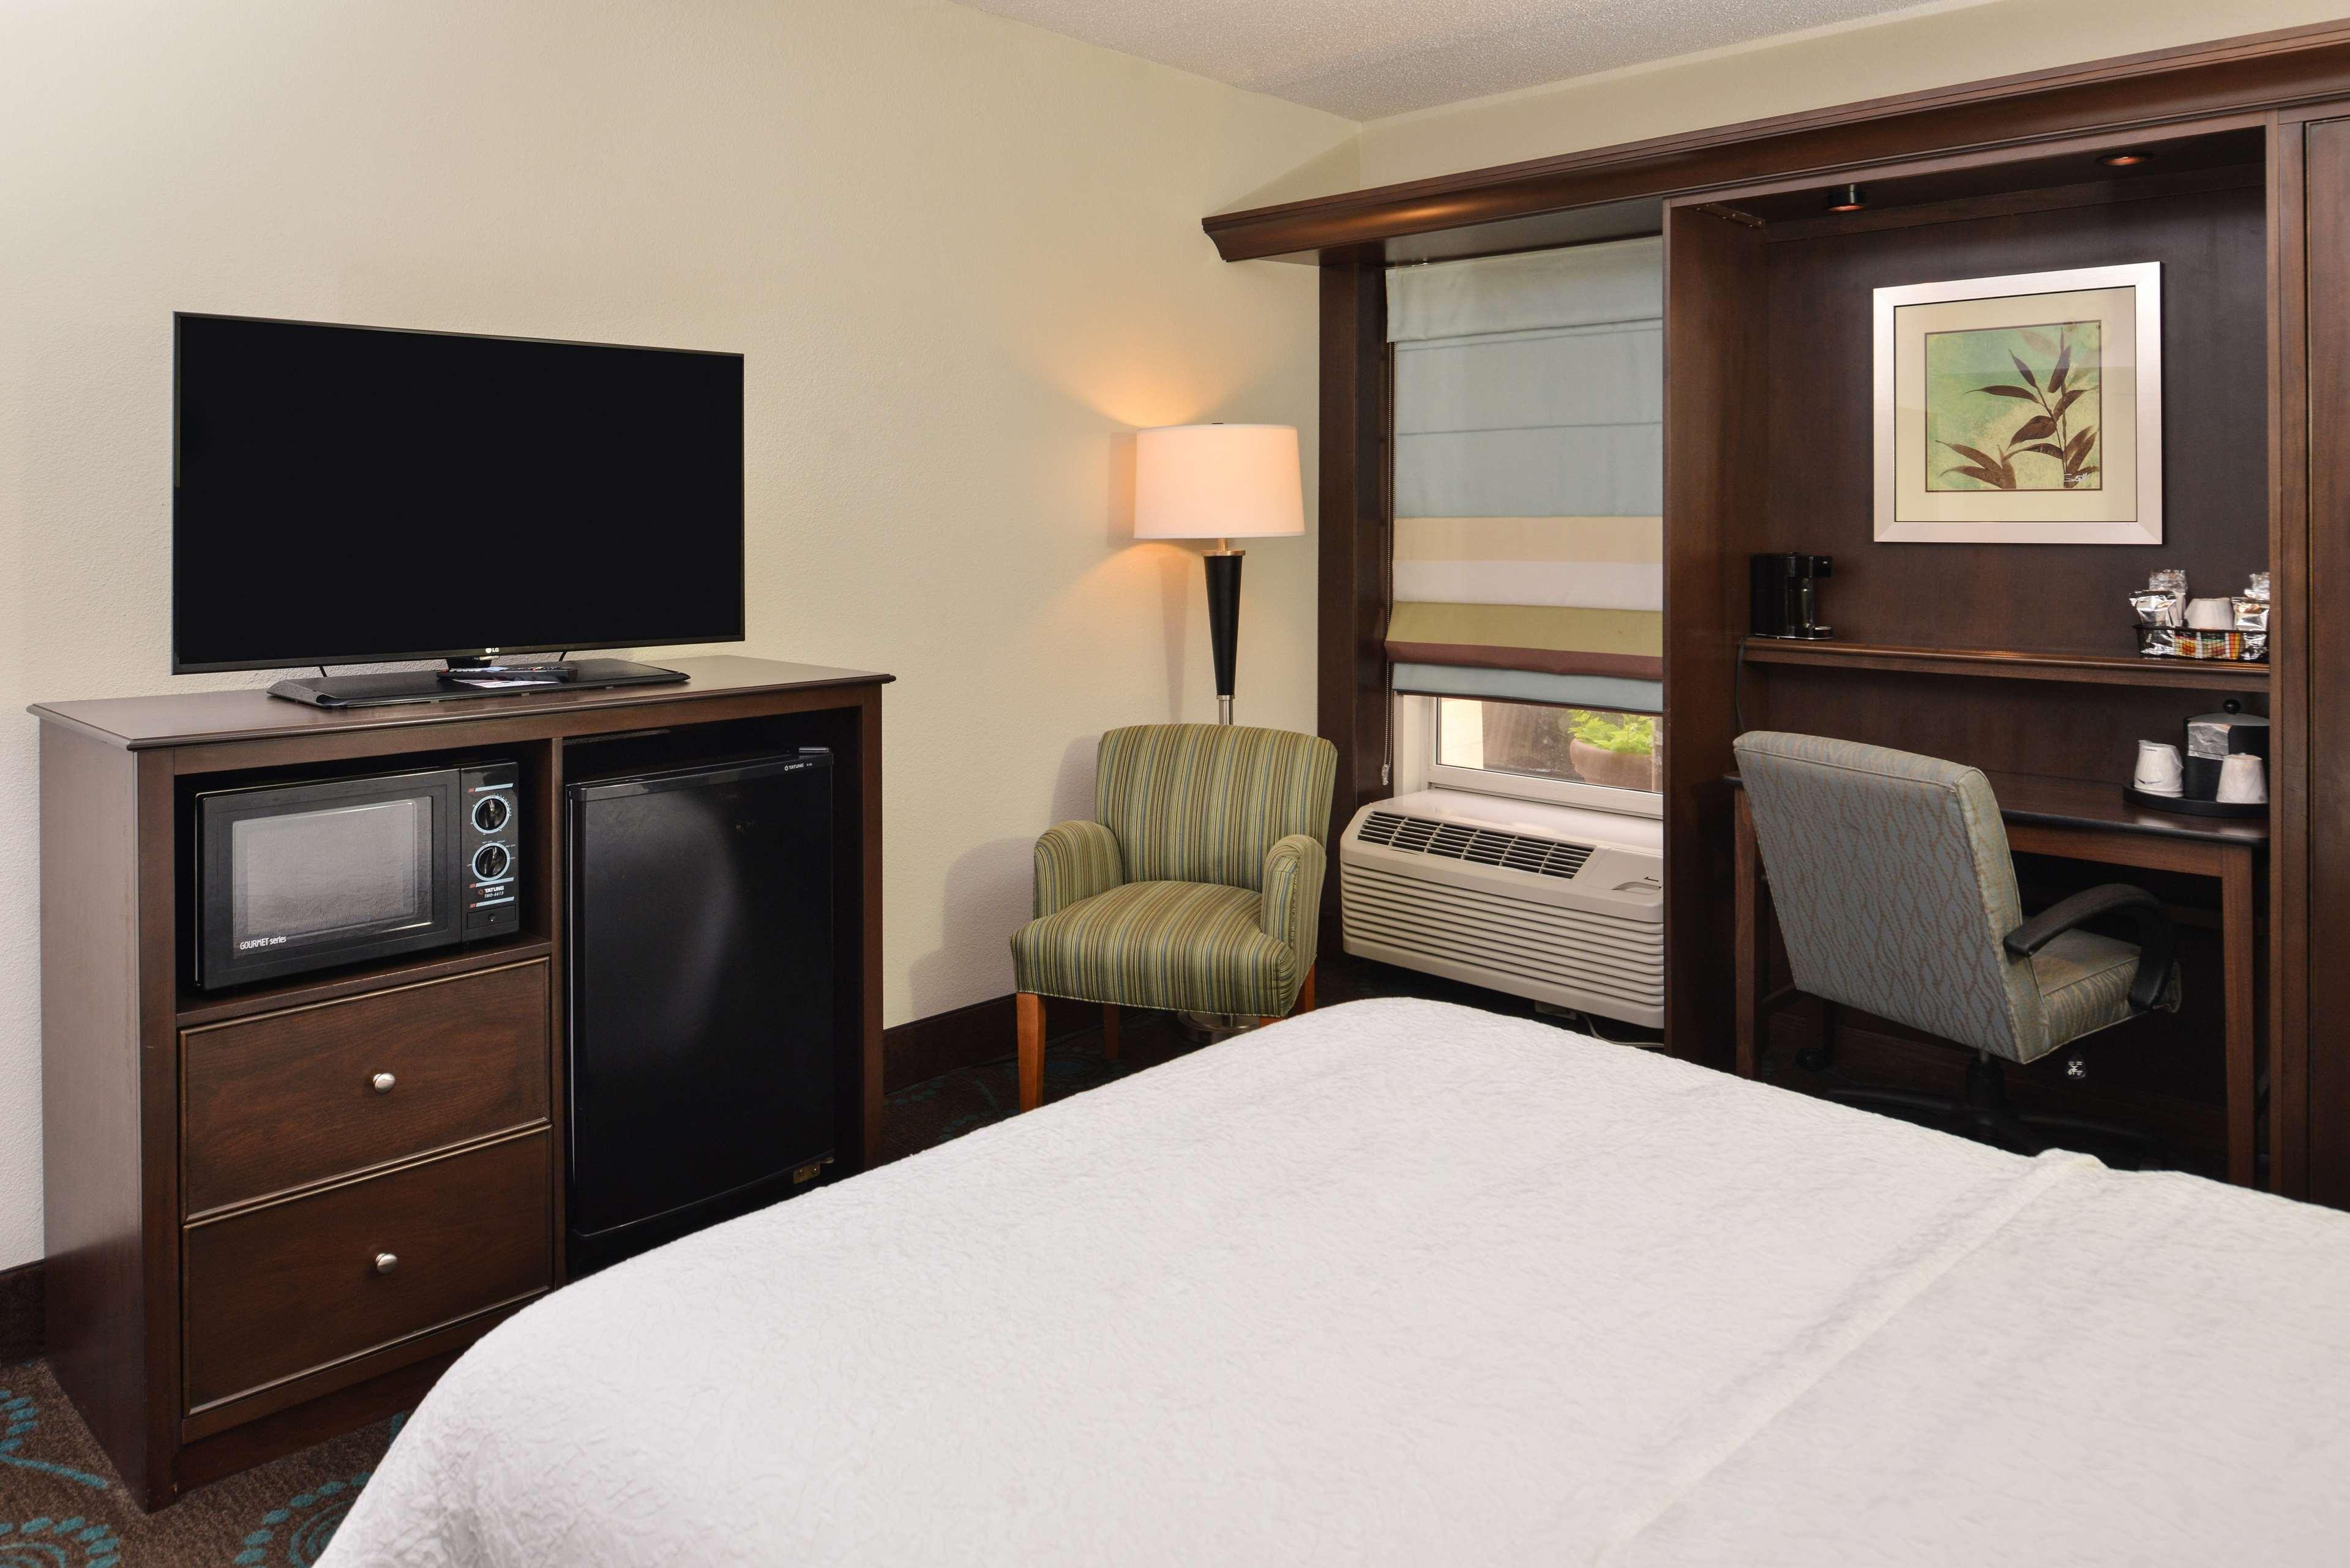 Hampton Inn & Suites Newport News (Oyster Point) image 31